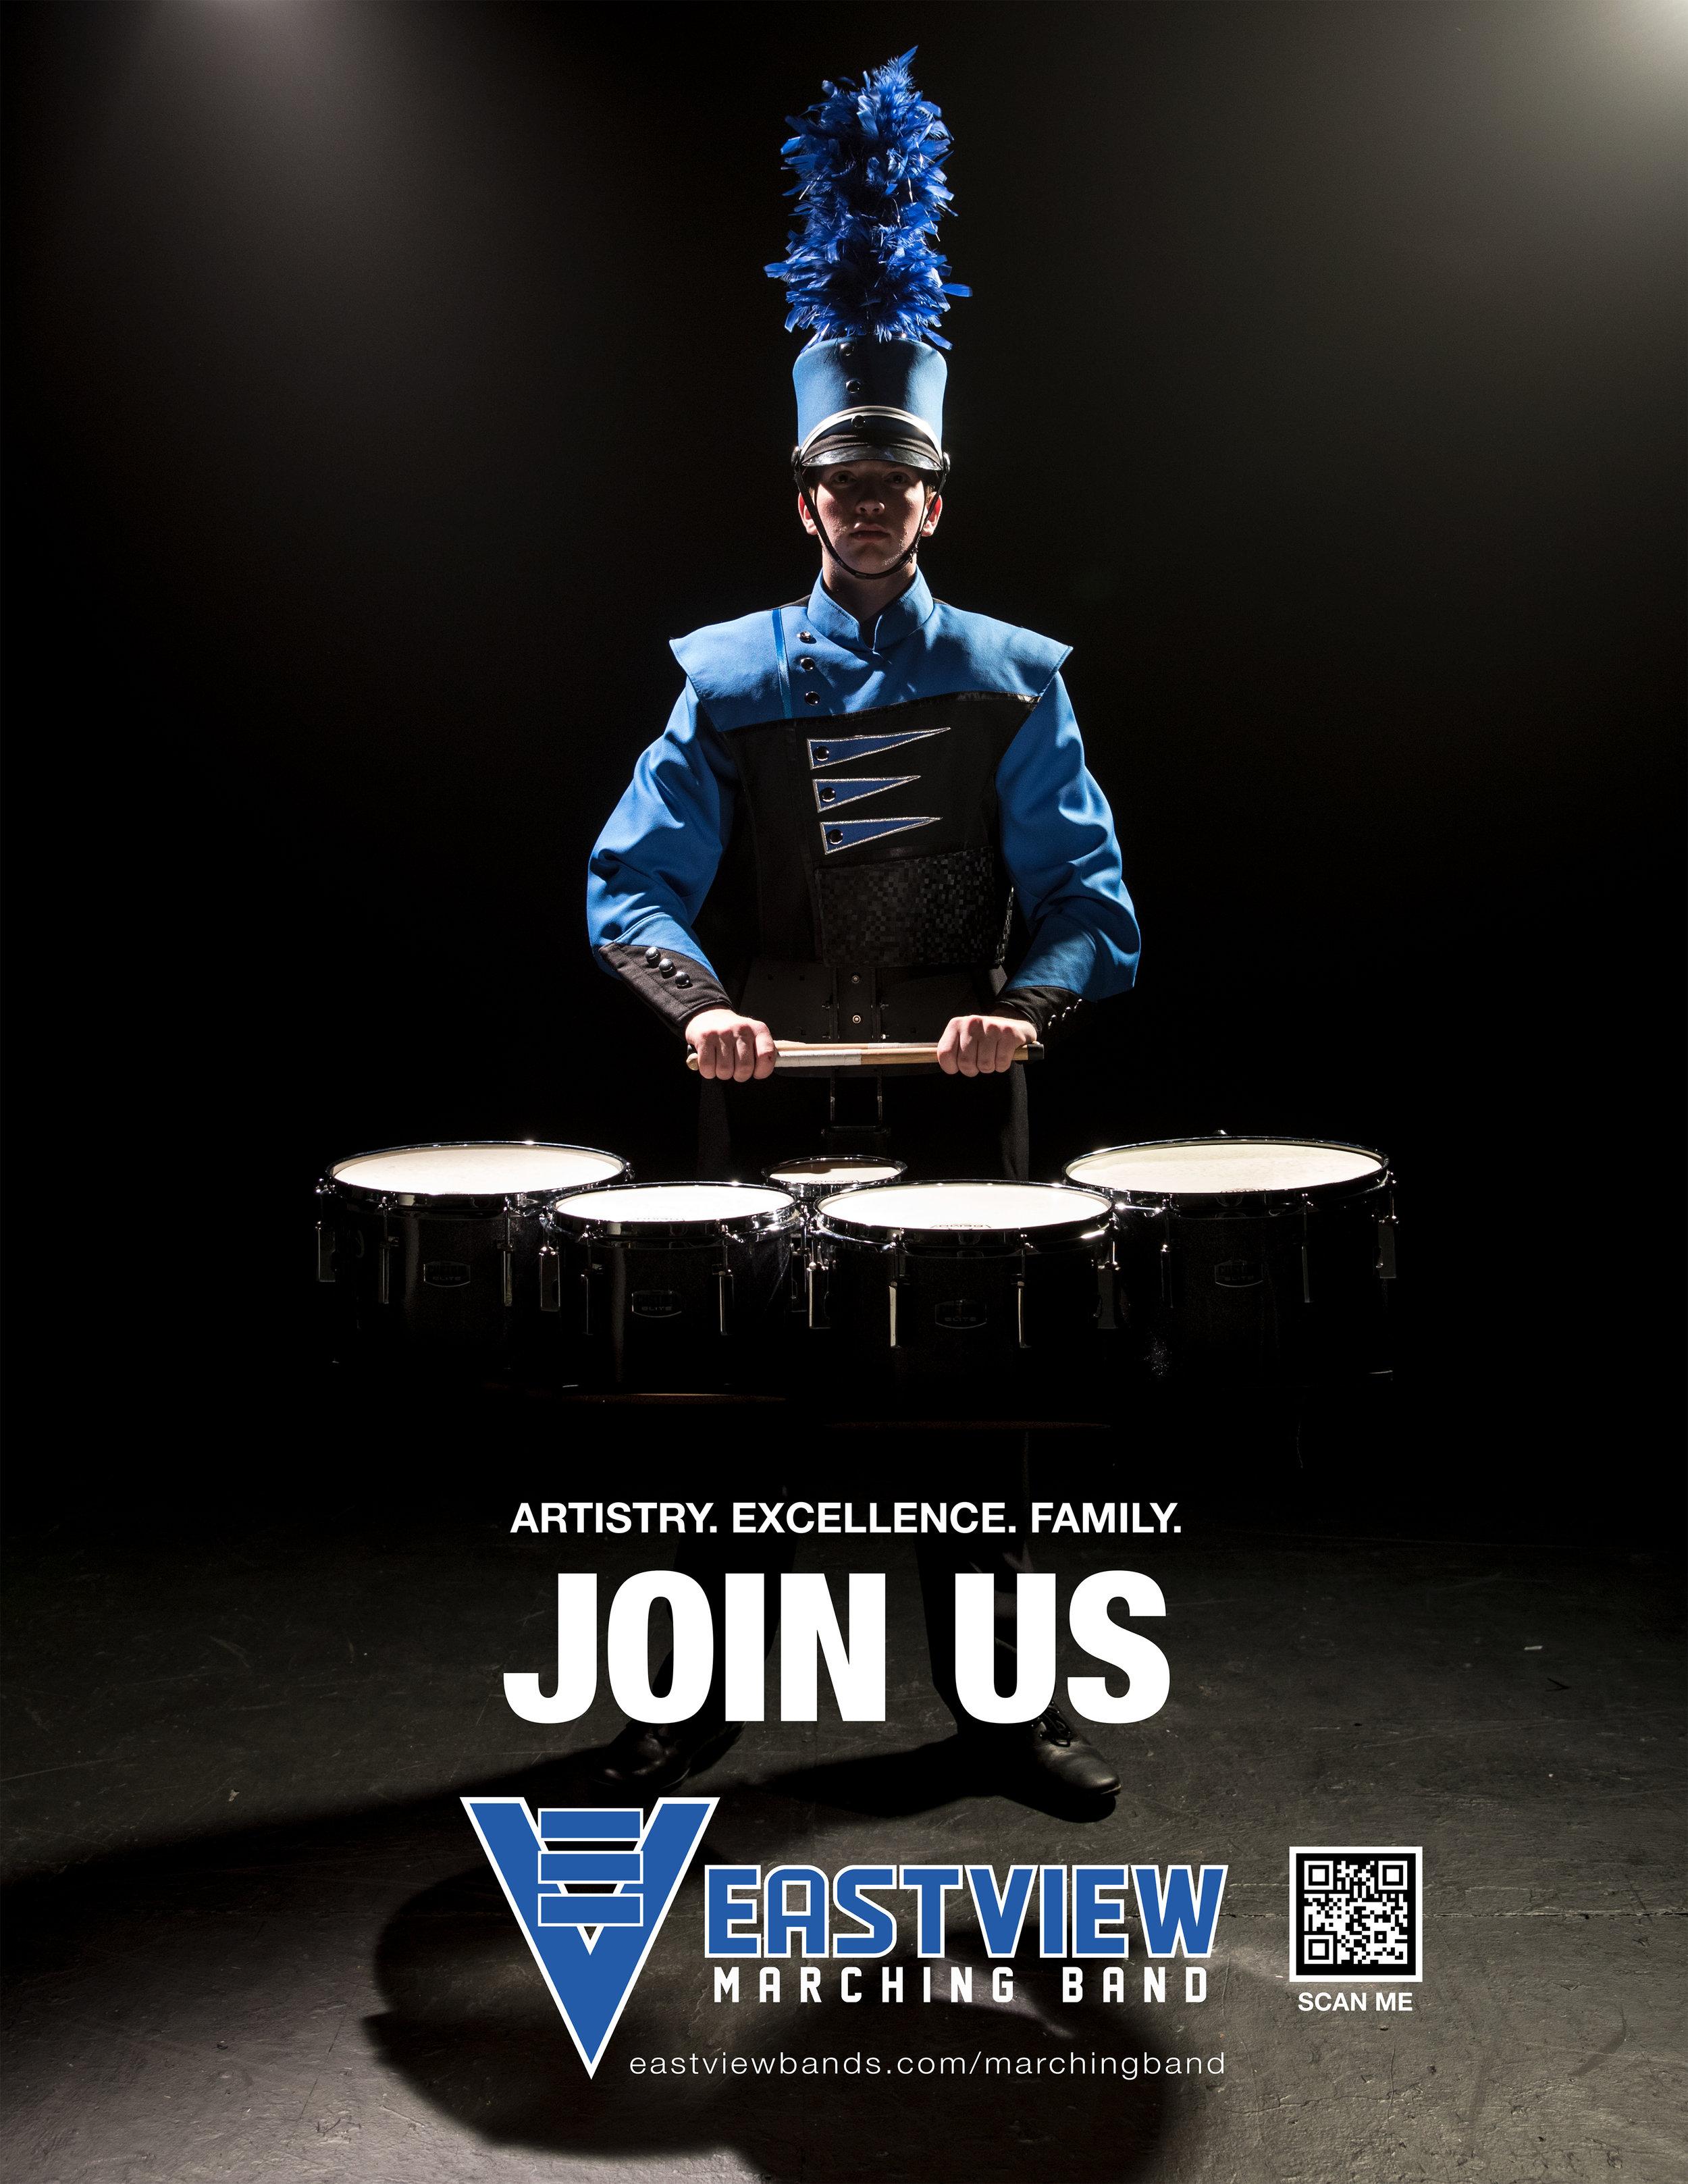 EVMB Recruiting Poster_2.jpg